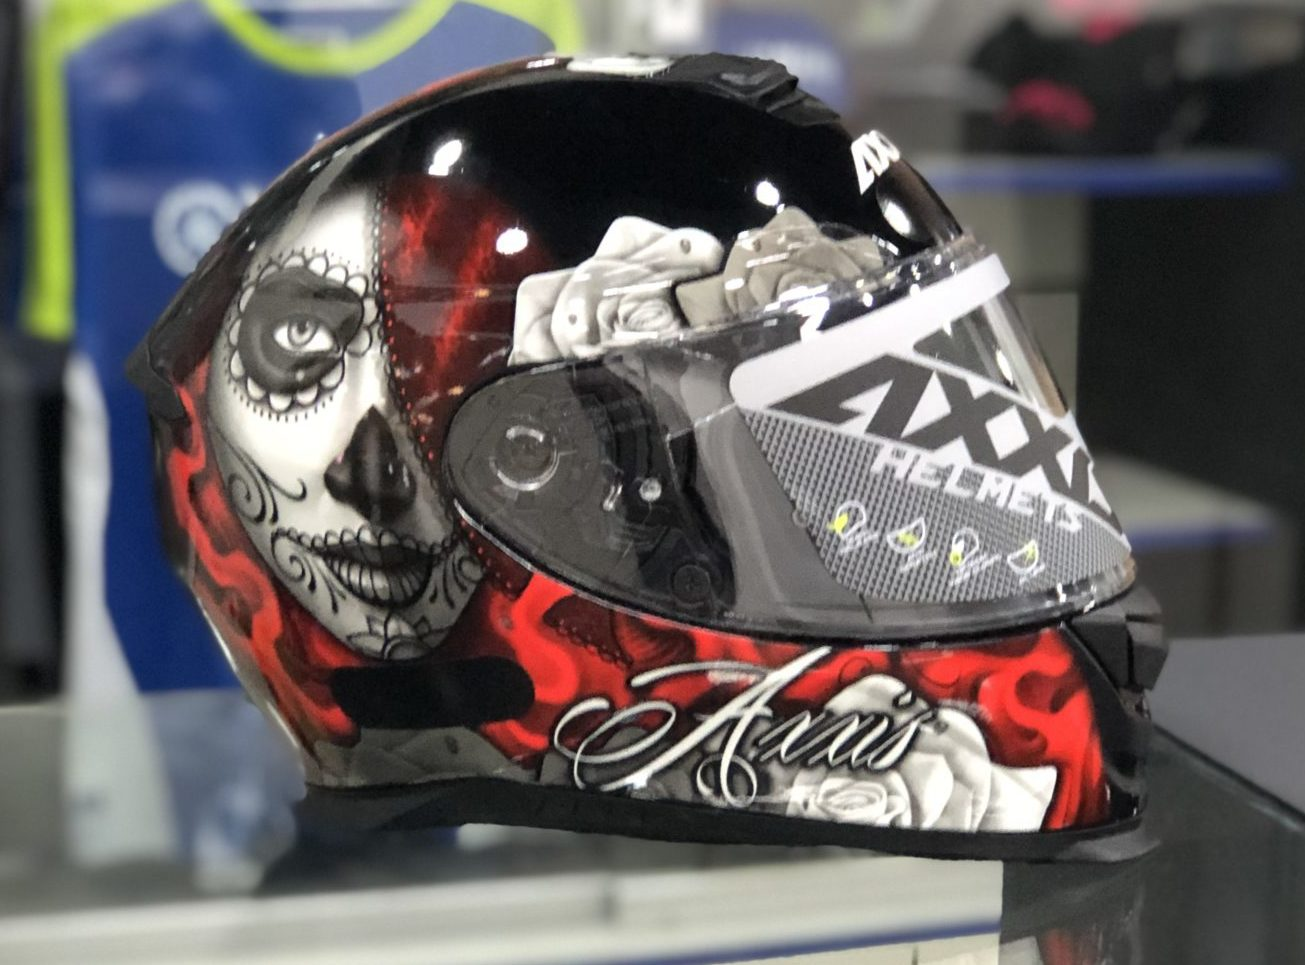 Axxis Eagle Lady – Vermelho e preto